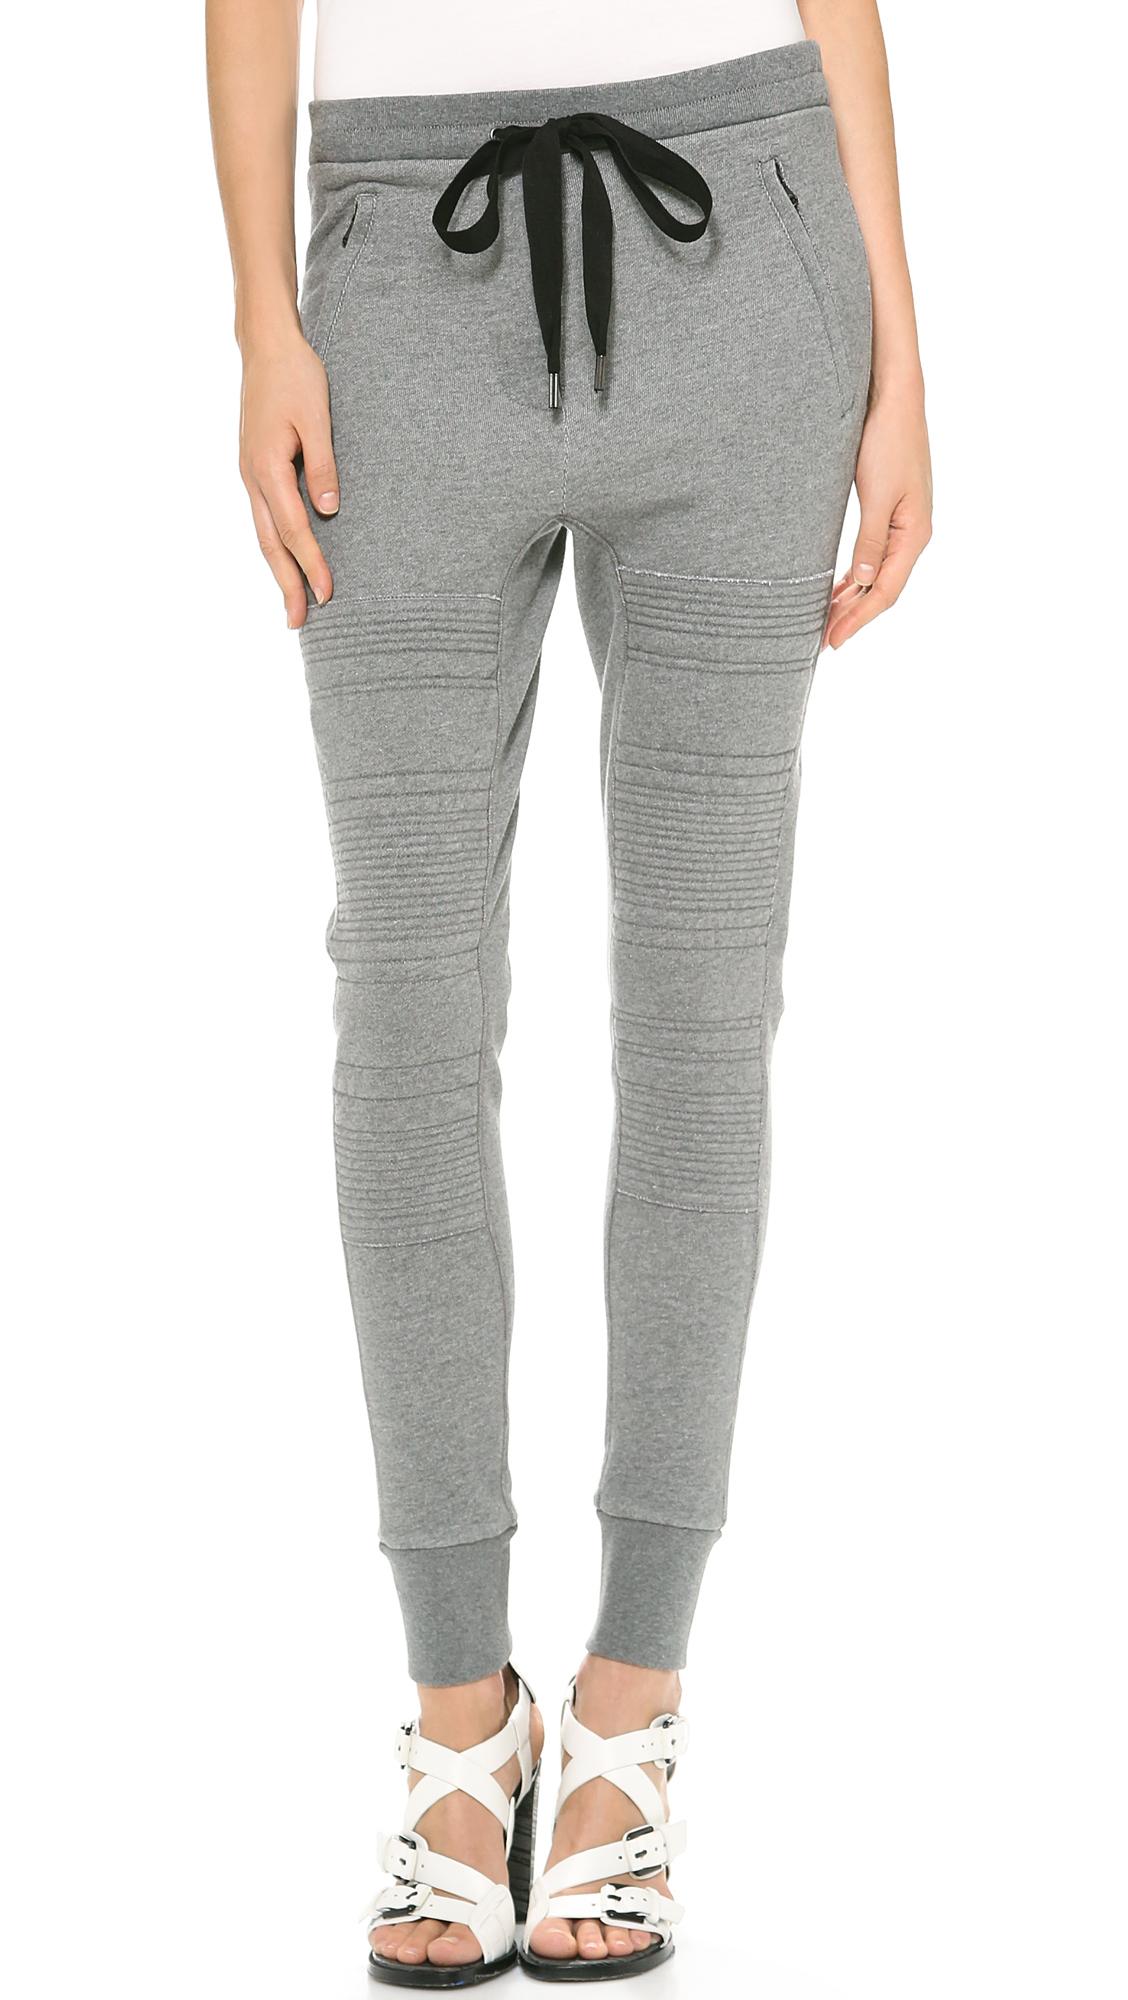 3.1 phillip lim stitched panel track pants